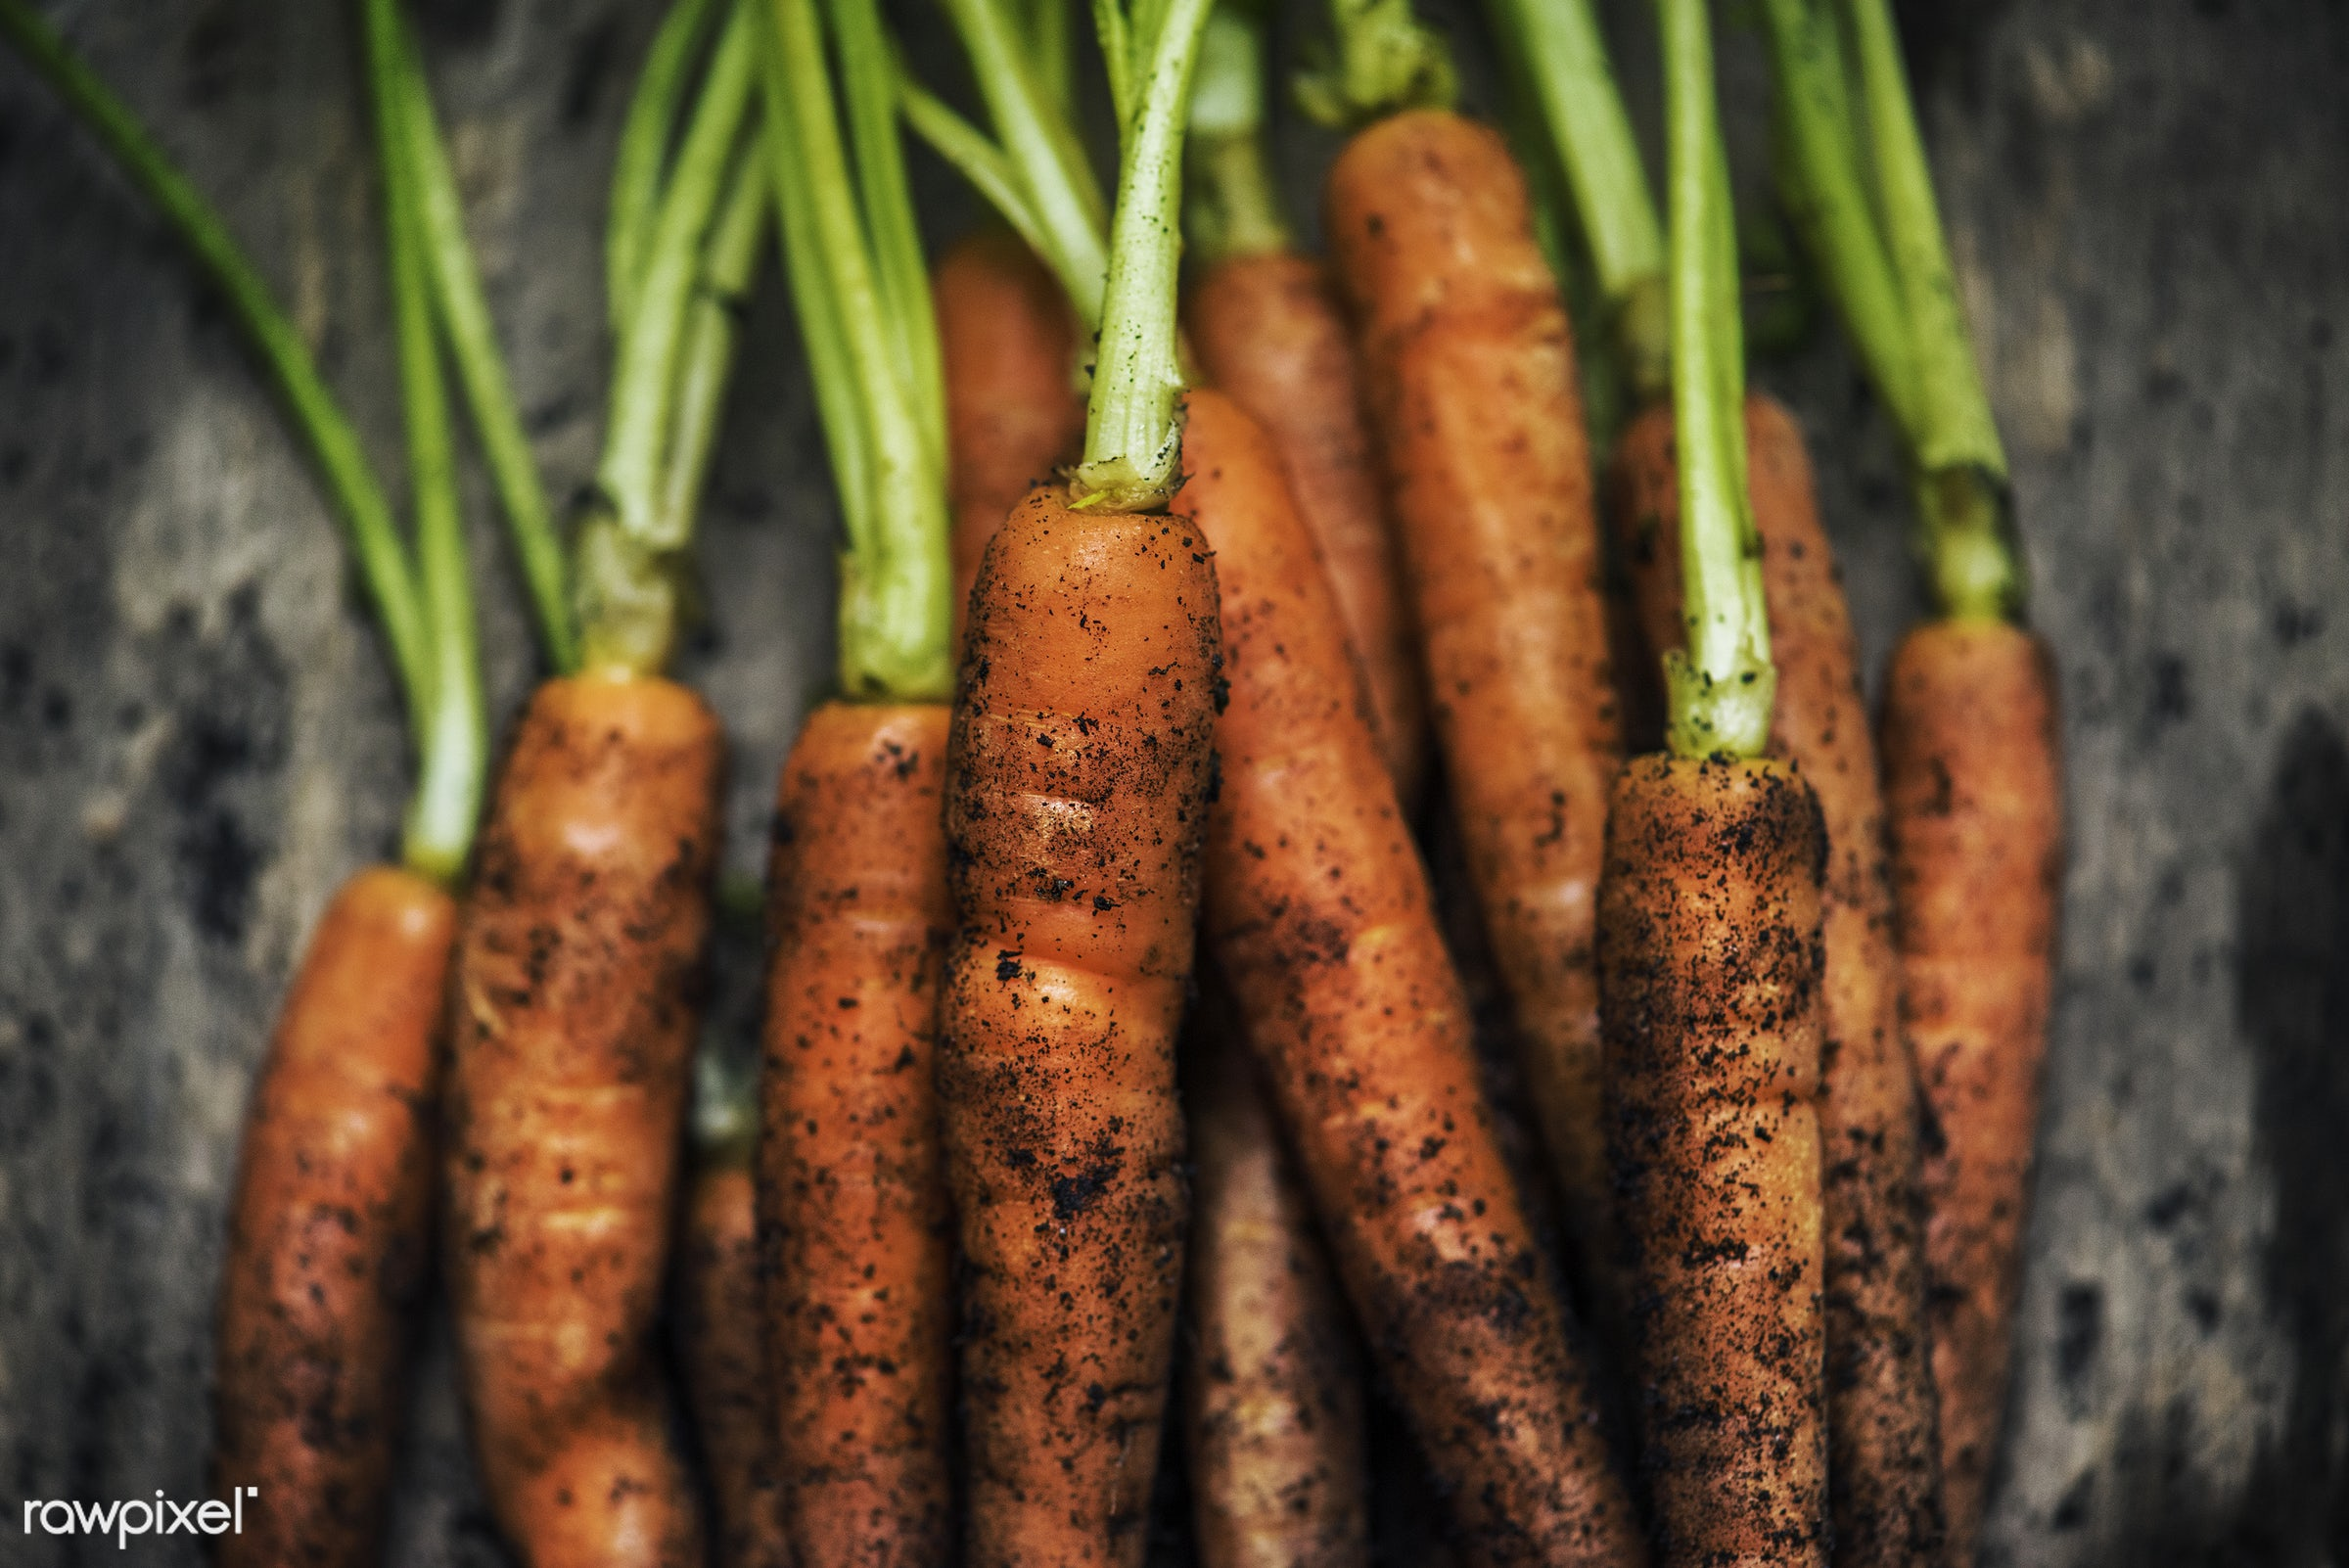 Fresh organic carrots - nutrients, real, organic, fresh, carrots, bunch, dirt, vegetable, closeup, soil